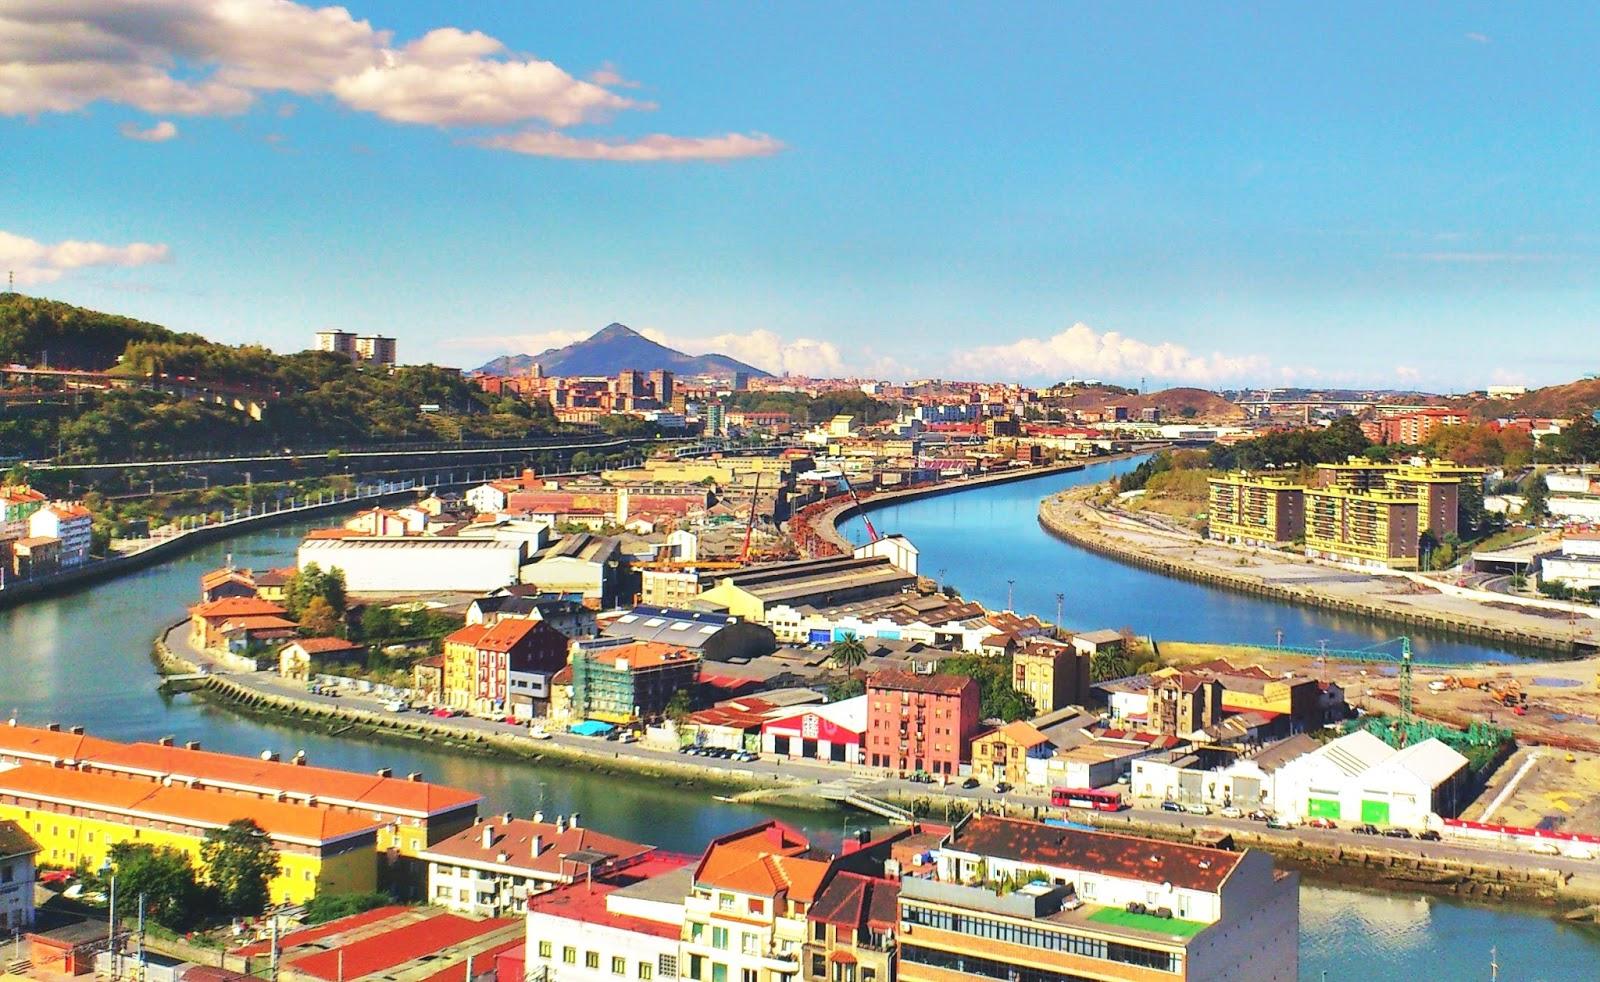 Bilbao,Serantes,Everest,Planeta Bilbao